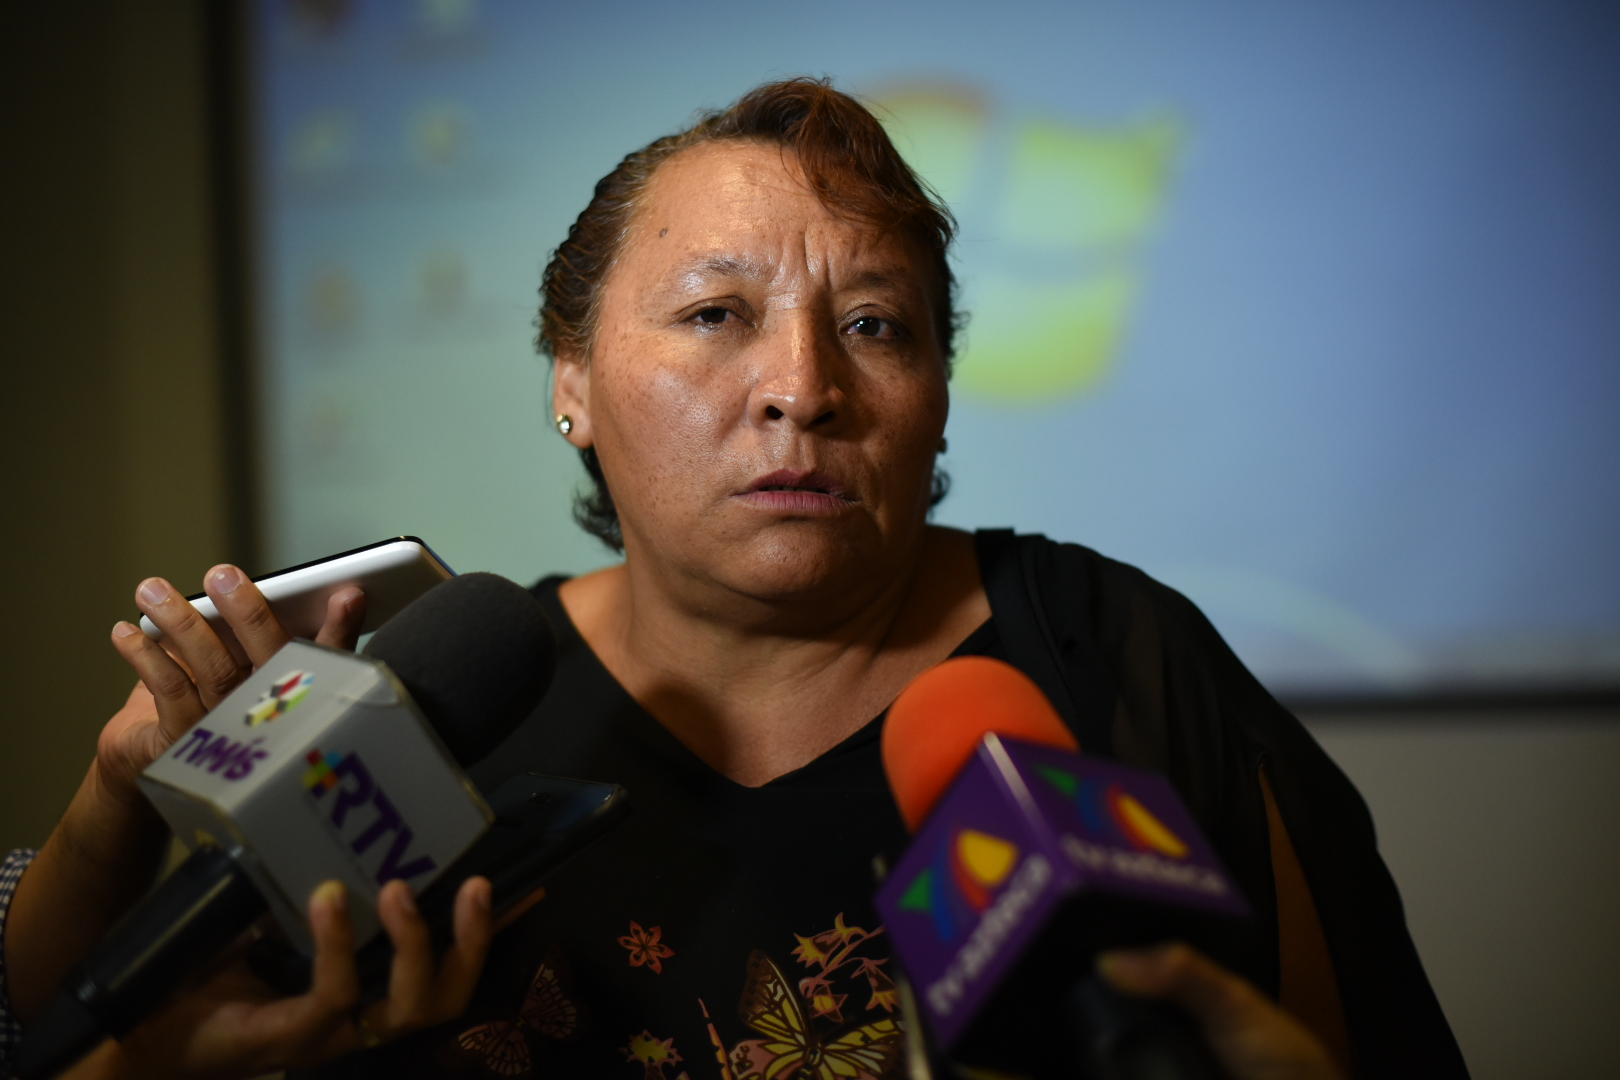 Albergan Las Patronas a familia guatemalteca agredida